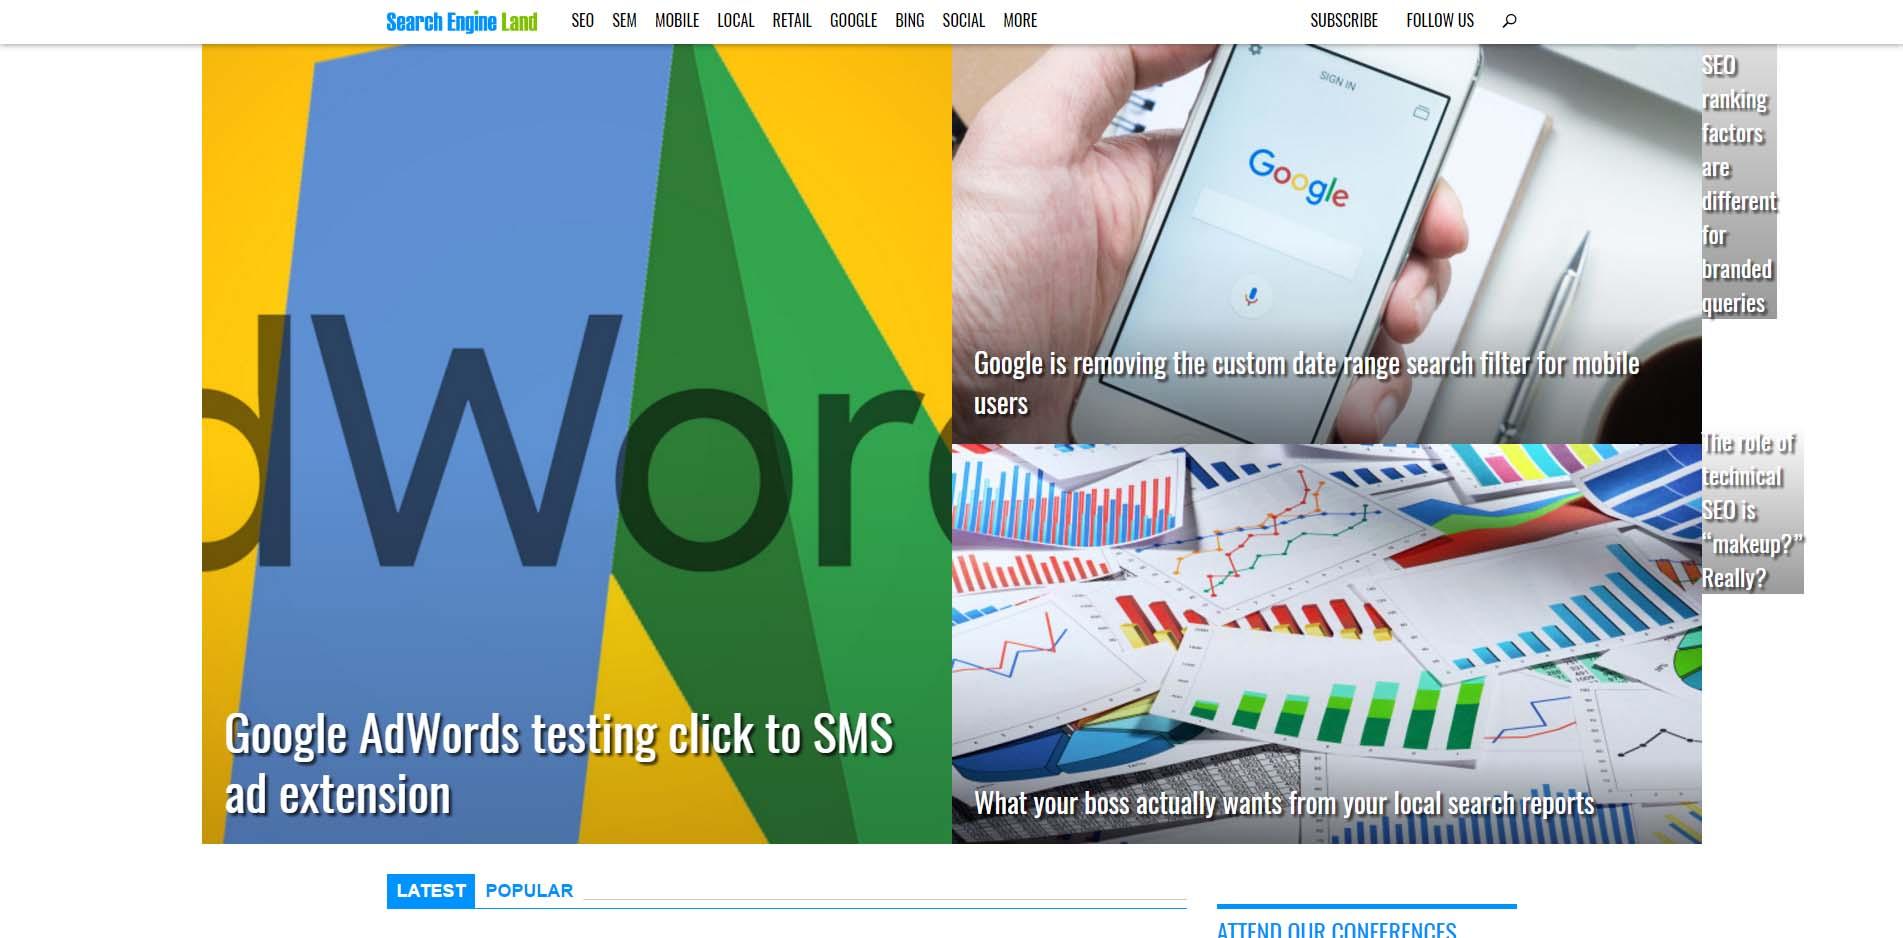 seo-blog-searchengineland-com